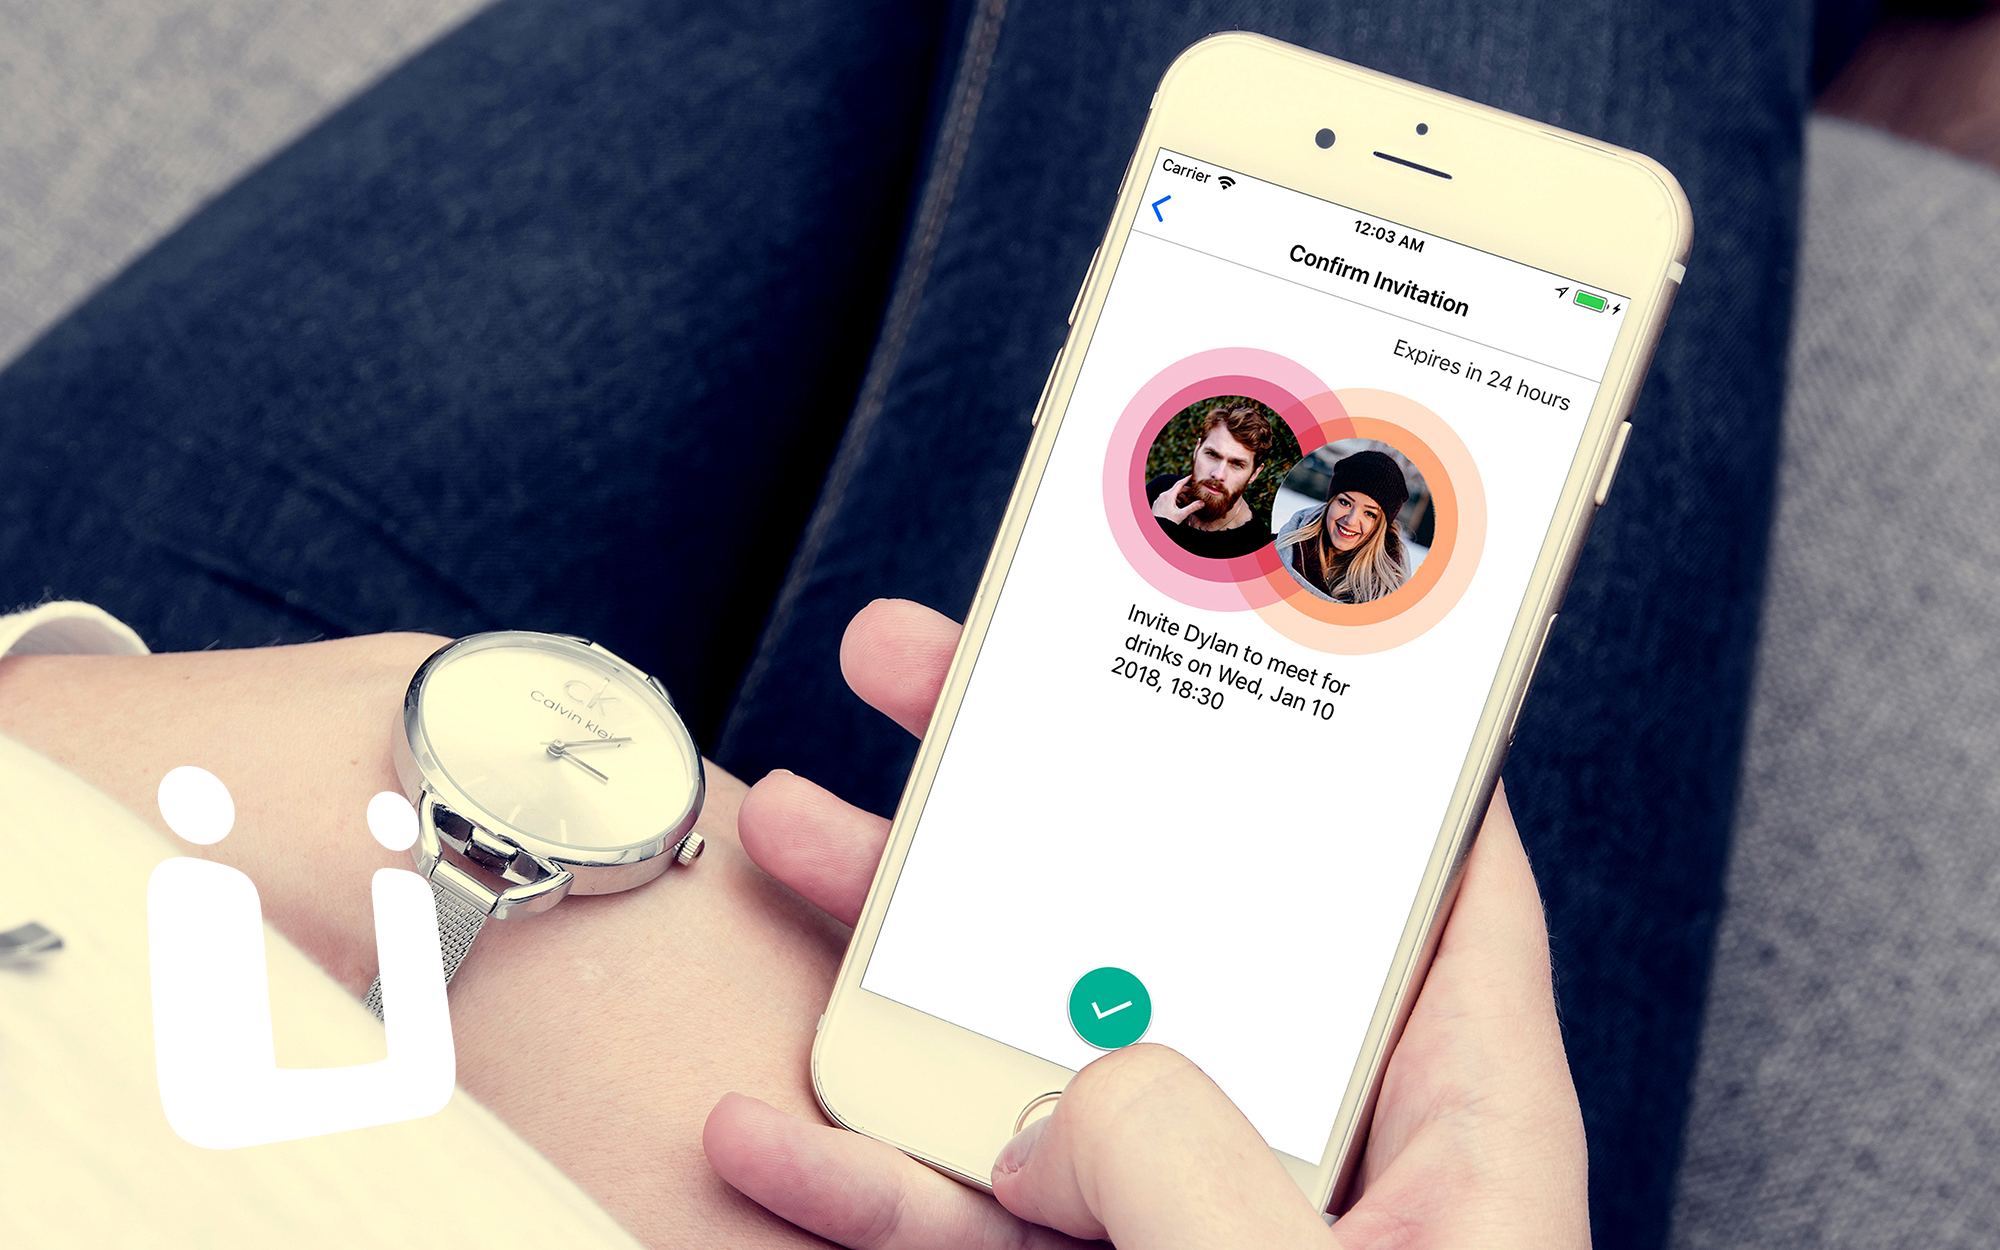 Visavis Dating App's picture